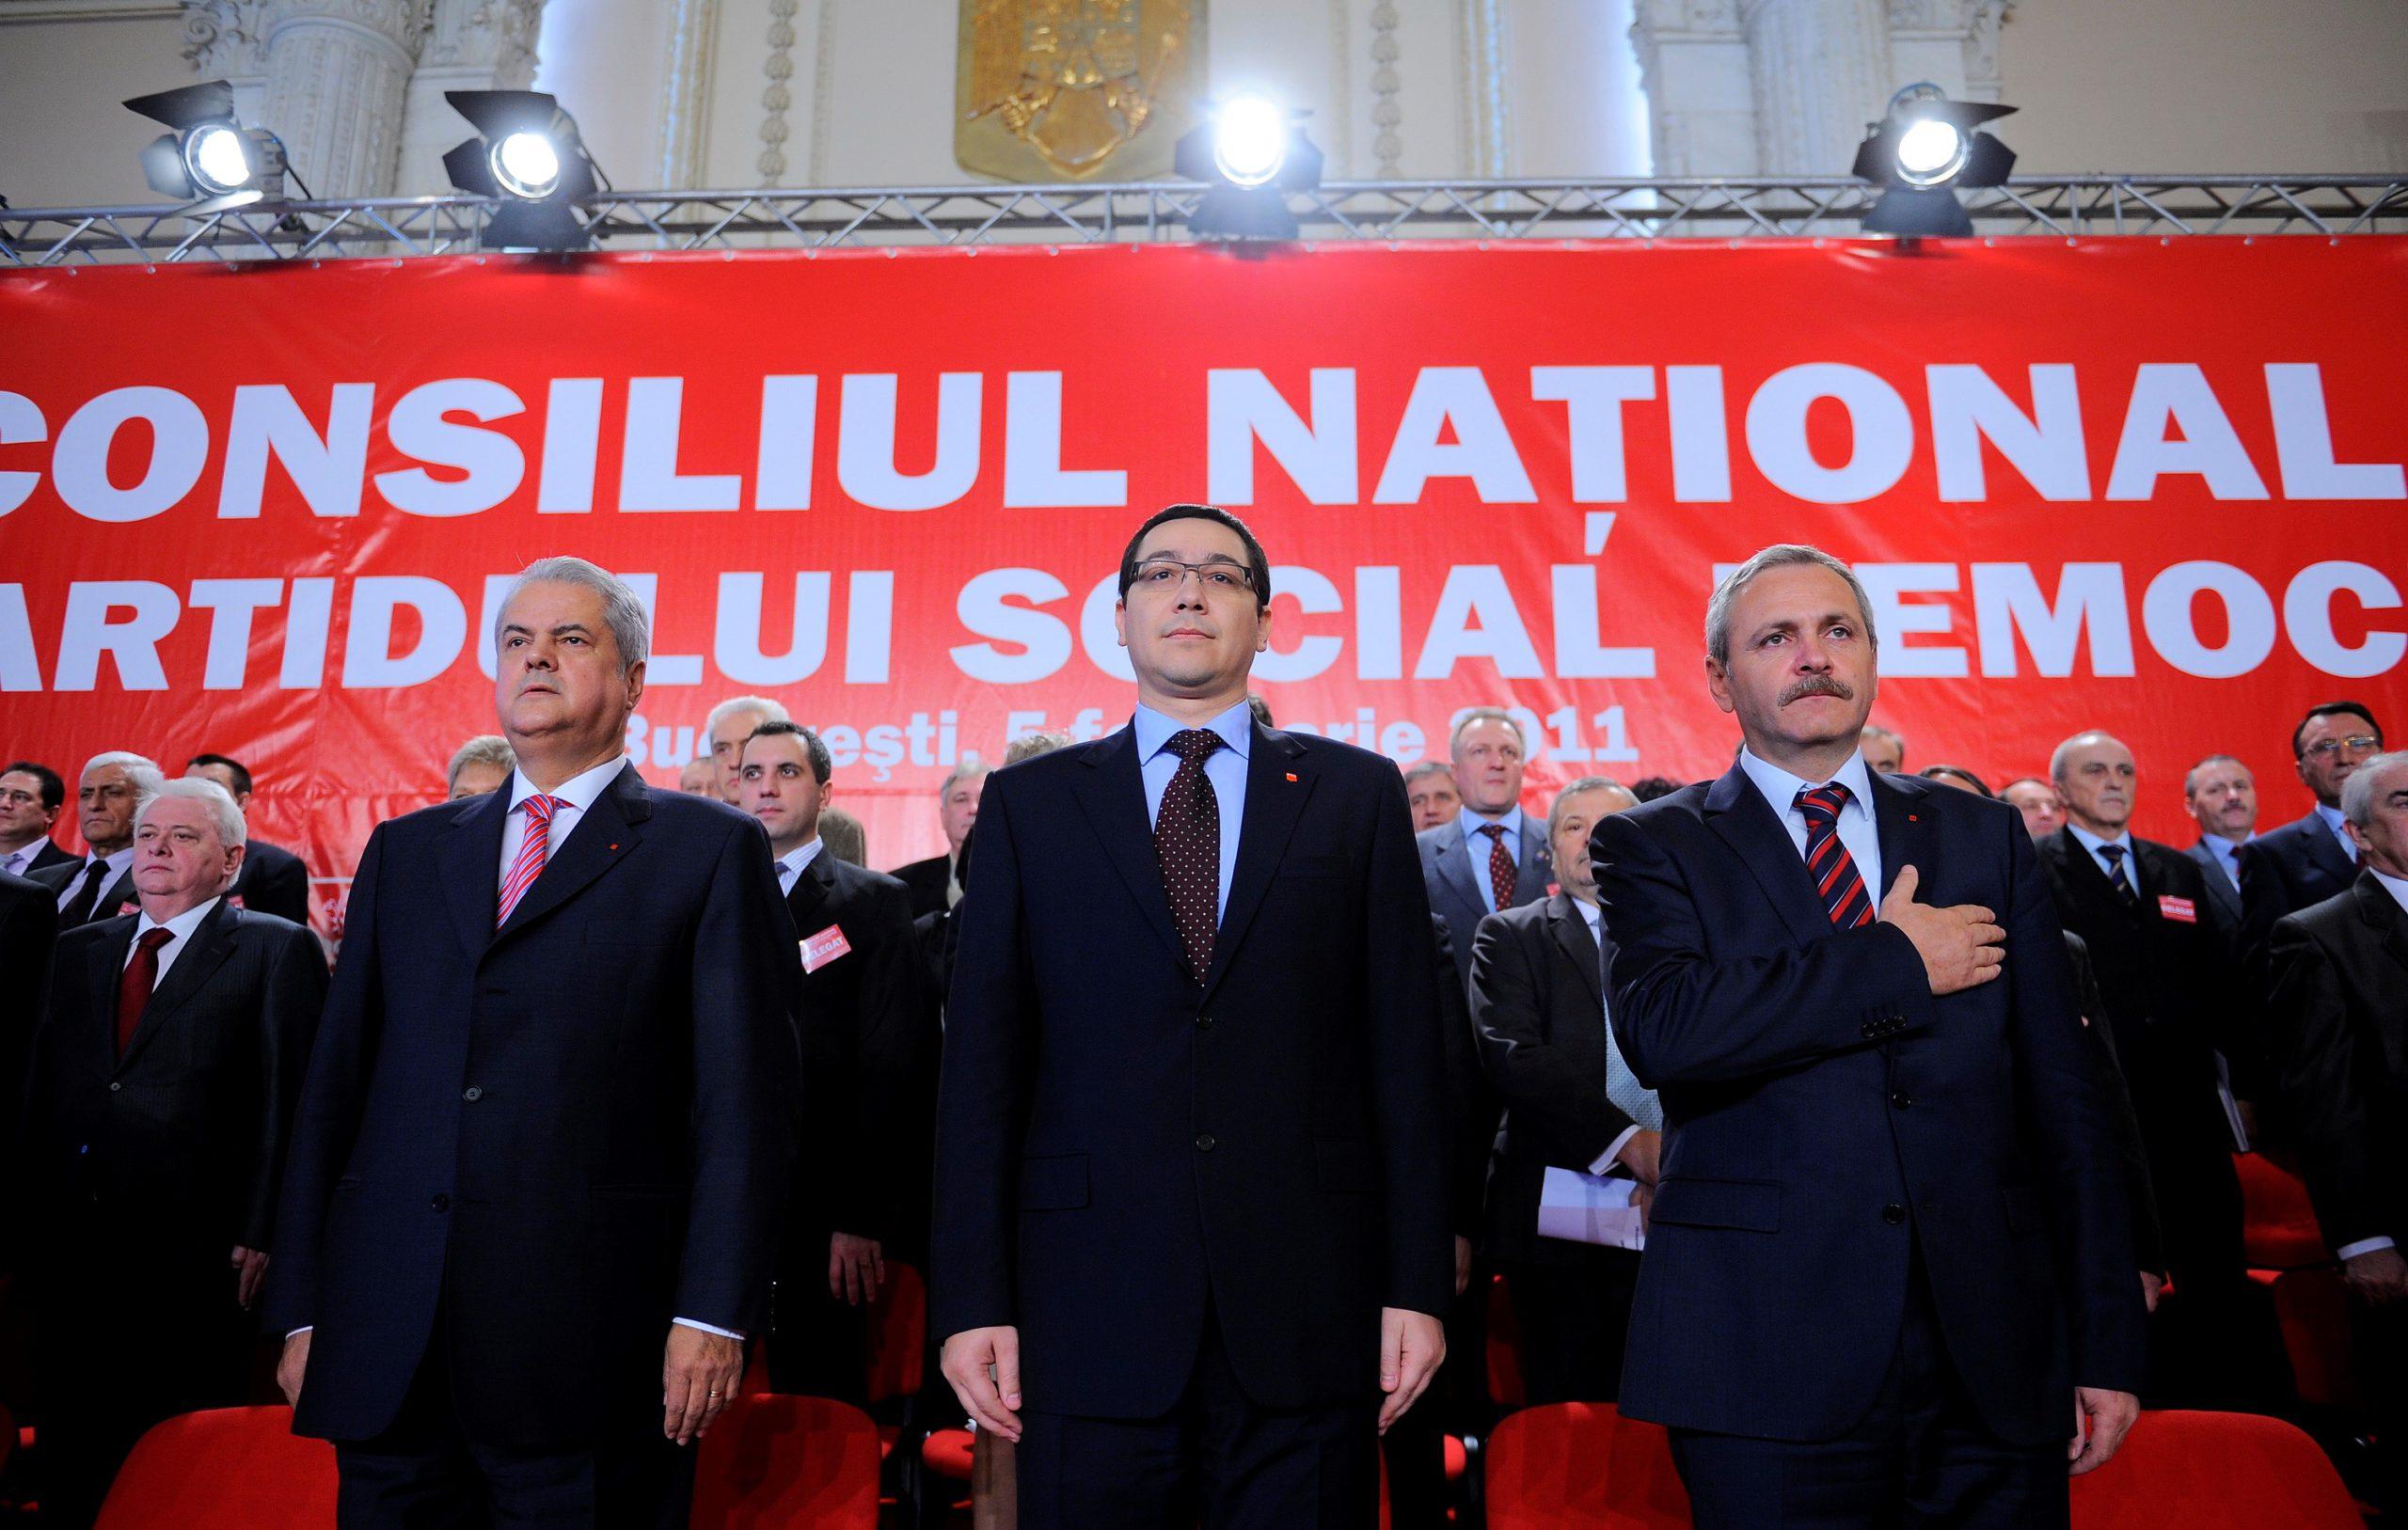 PSD-ul, pe scurt: Adrian Nastase, Victor Ponta si Liviu Dragnea. FOTO: Răzvan Chiriță / Mediafaxfoto